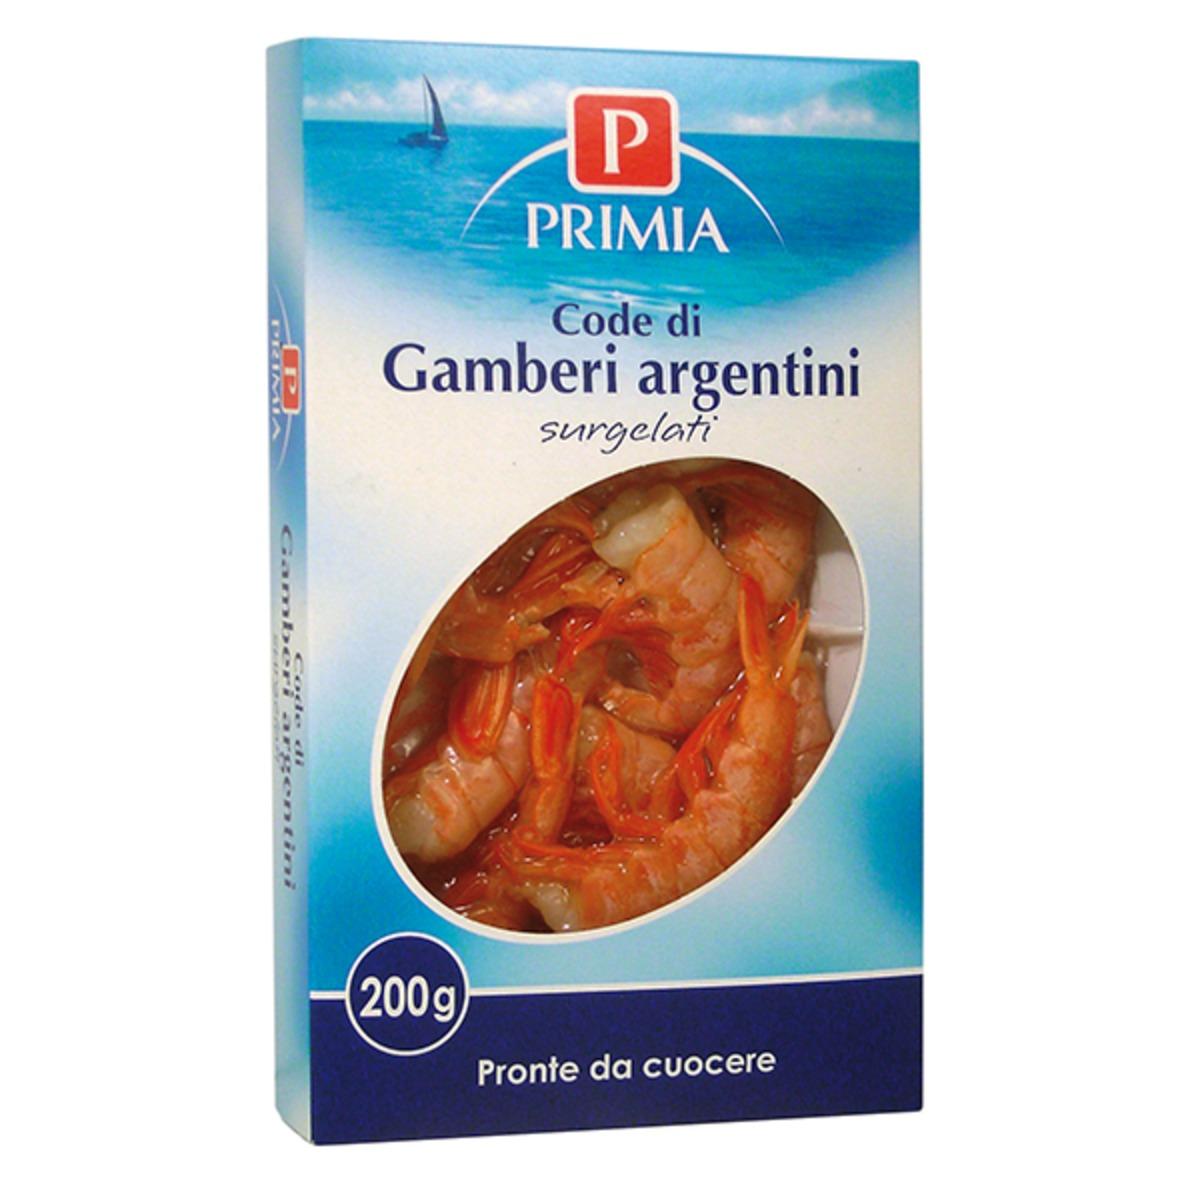 CODE DI GAMBERO ARGENTINA